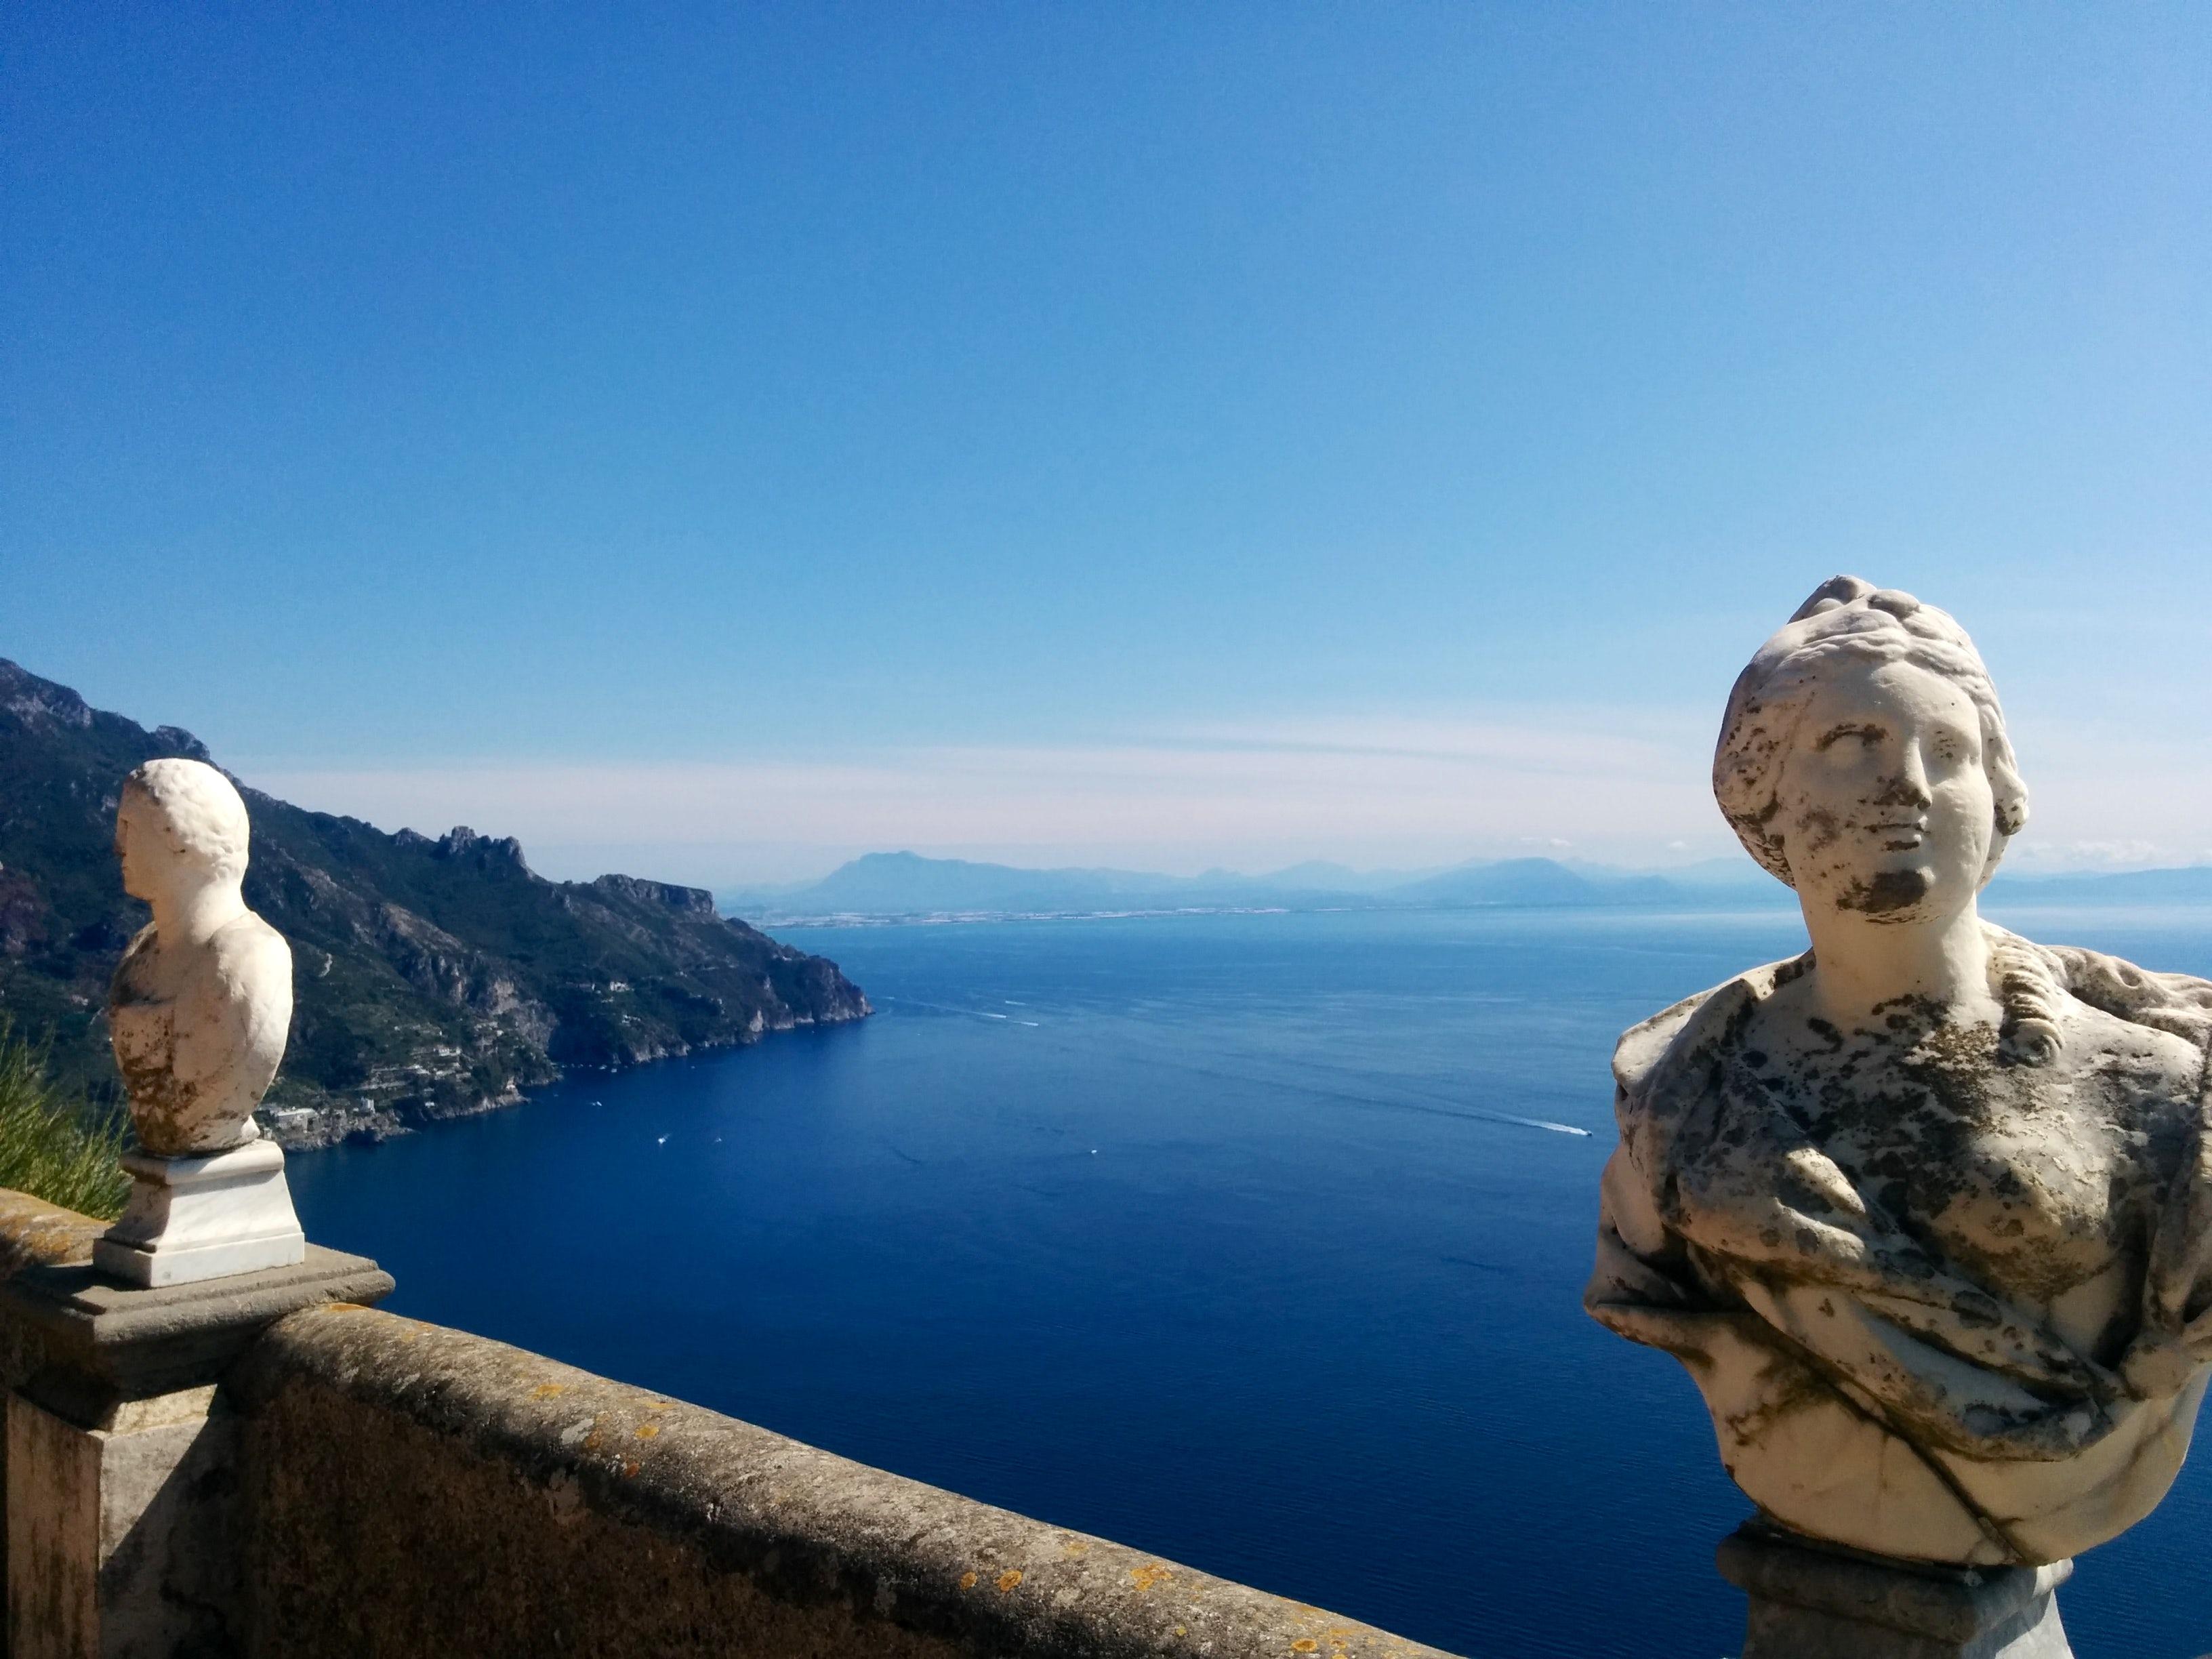 The breathtaking Terrace of Infinity in Villa Cimbrone, Ravello